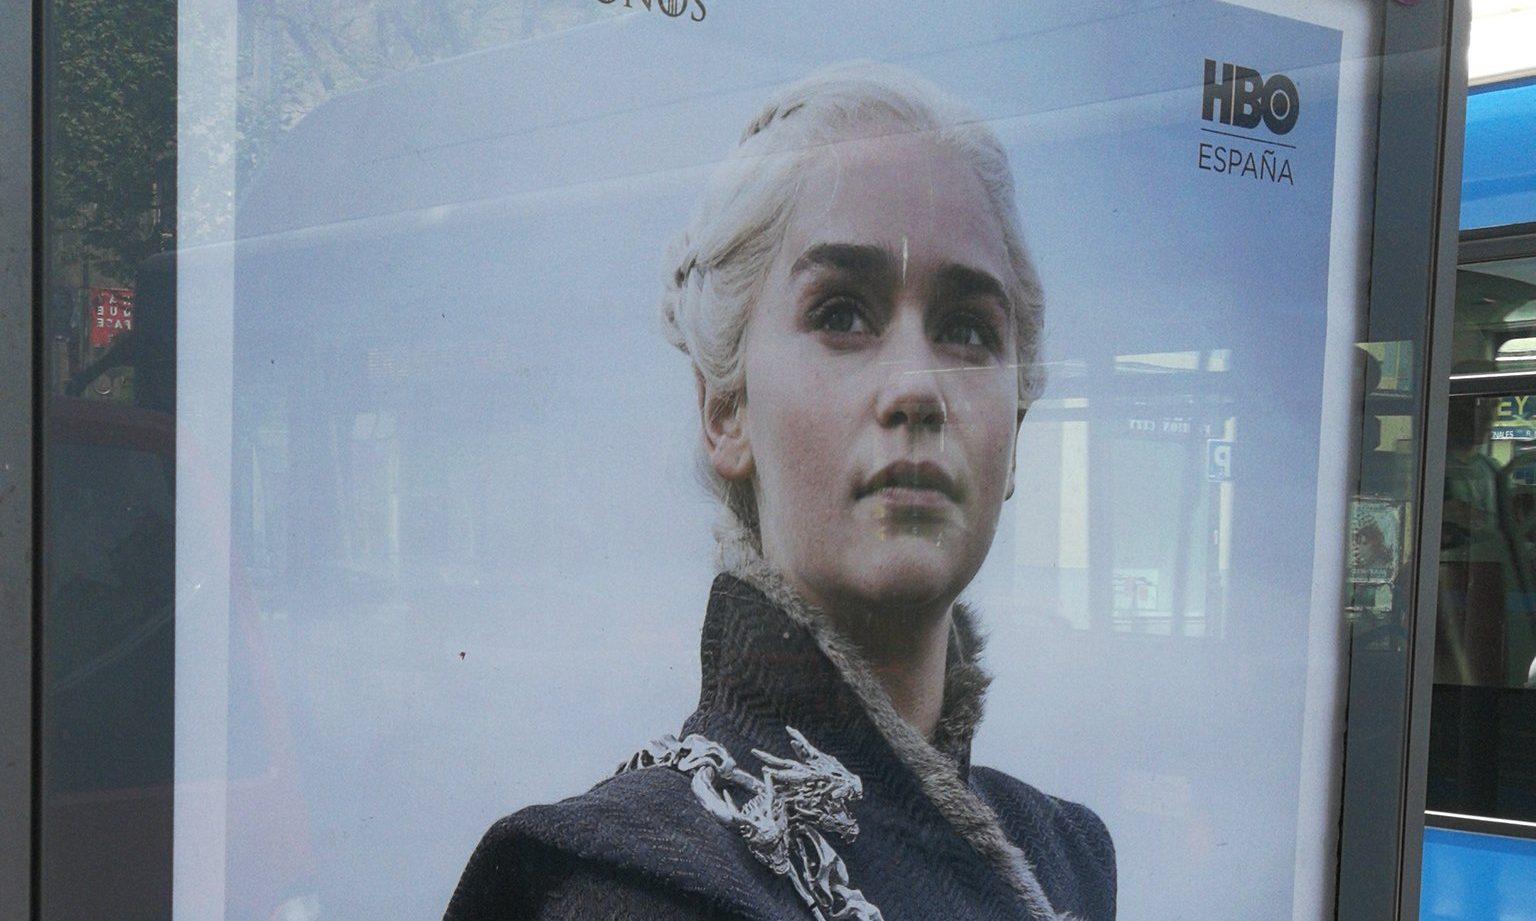 Juego de Tronos Vota Khaleesi